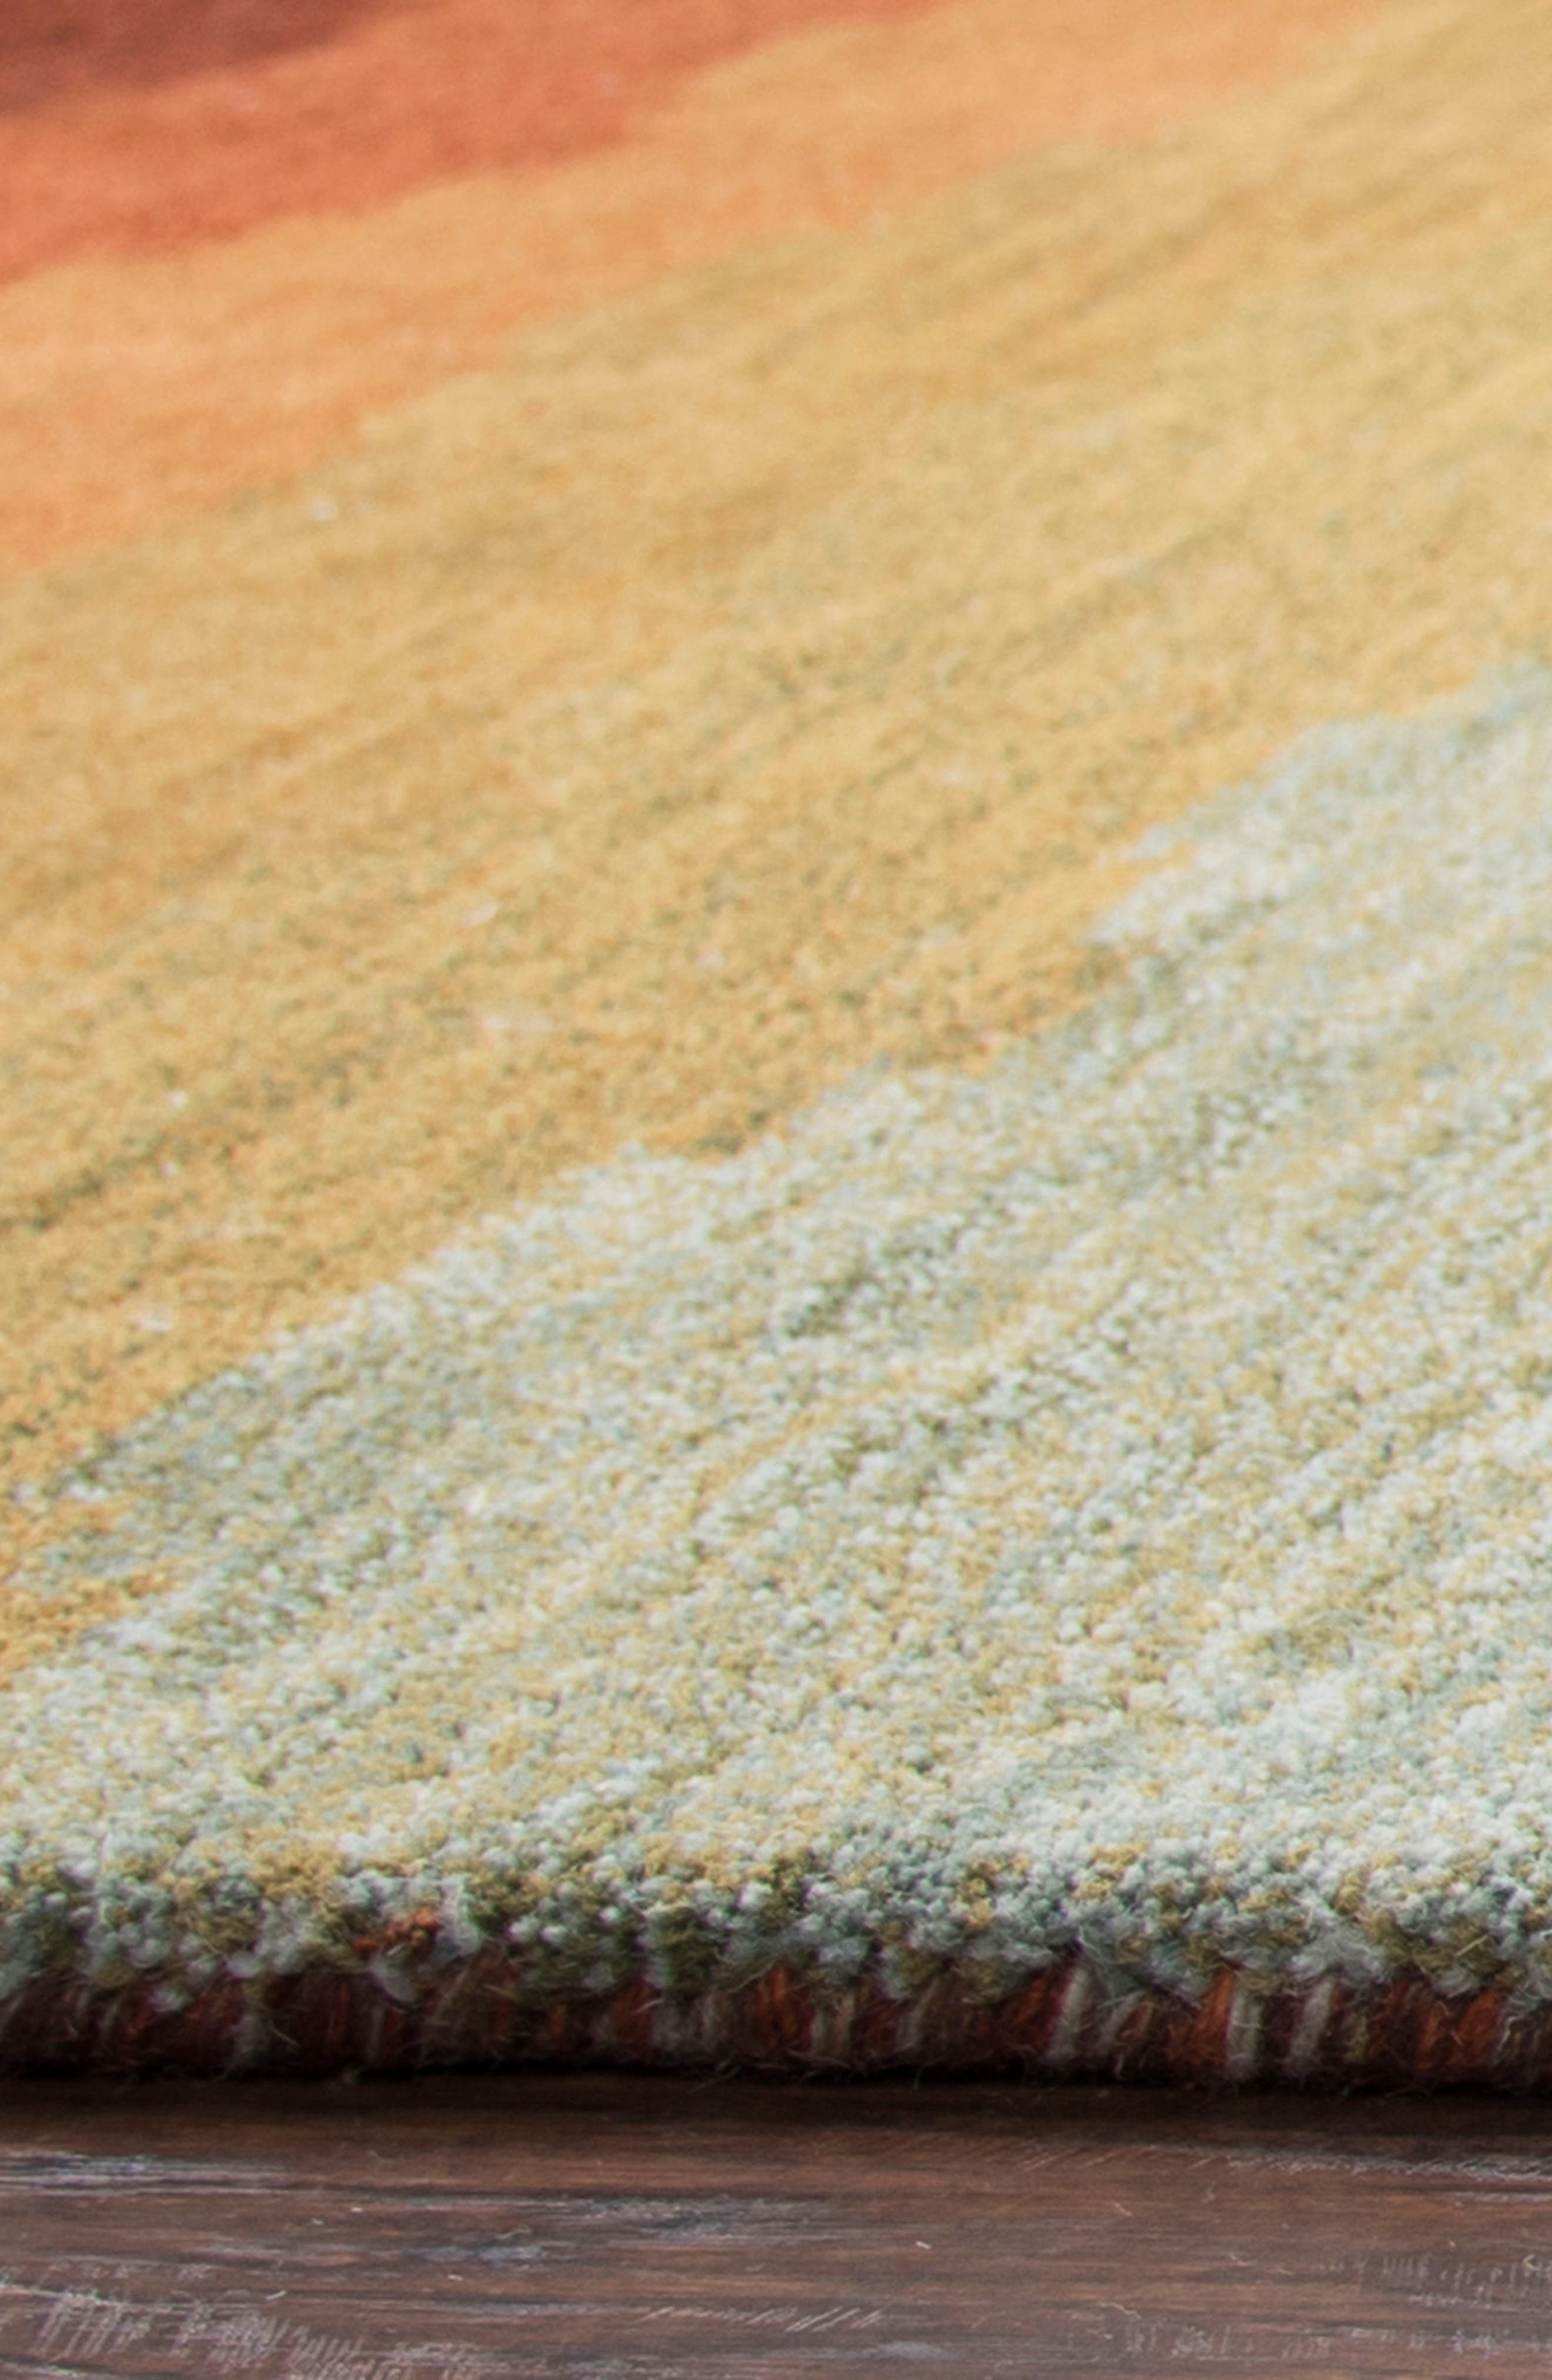 Desert Oasis Hand Tufted Wool Area Rug,                             Alternate thumbnail 5, color,                             220